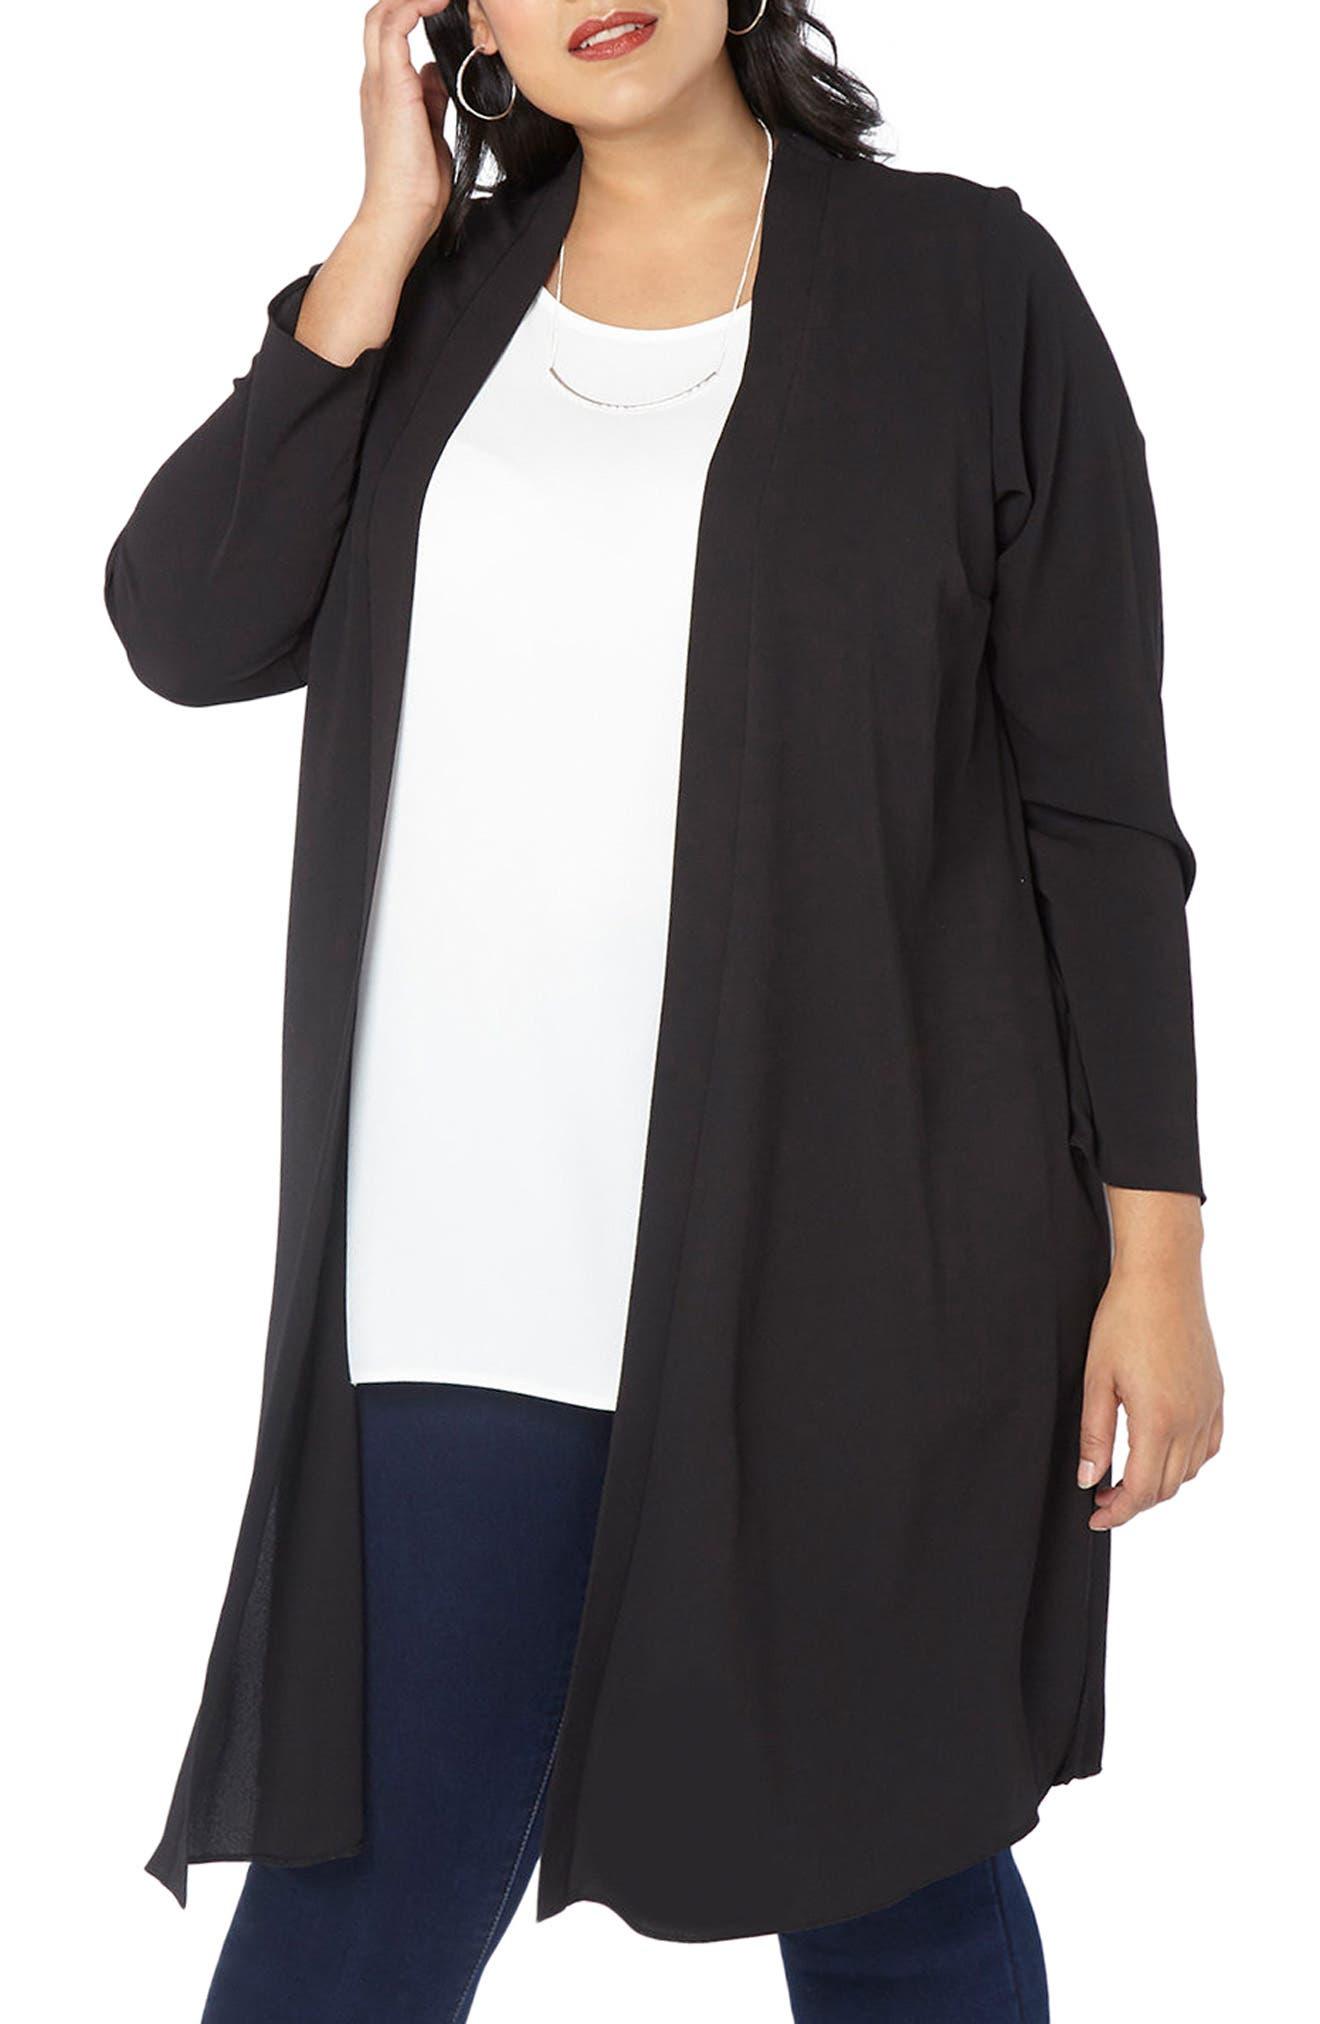 Alternate Image 1 Selected - Evans Long Jacket (Plus Size)